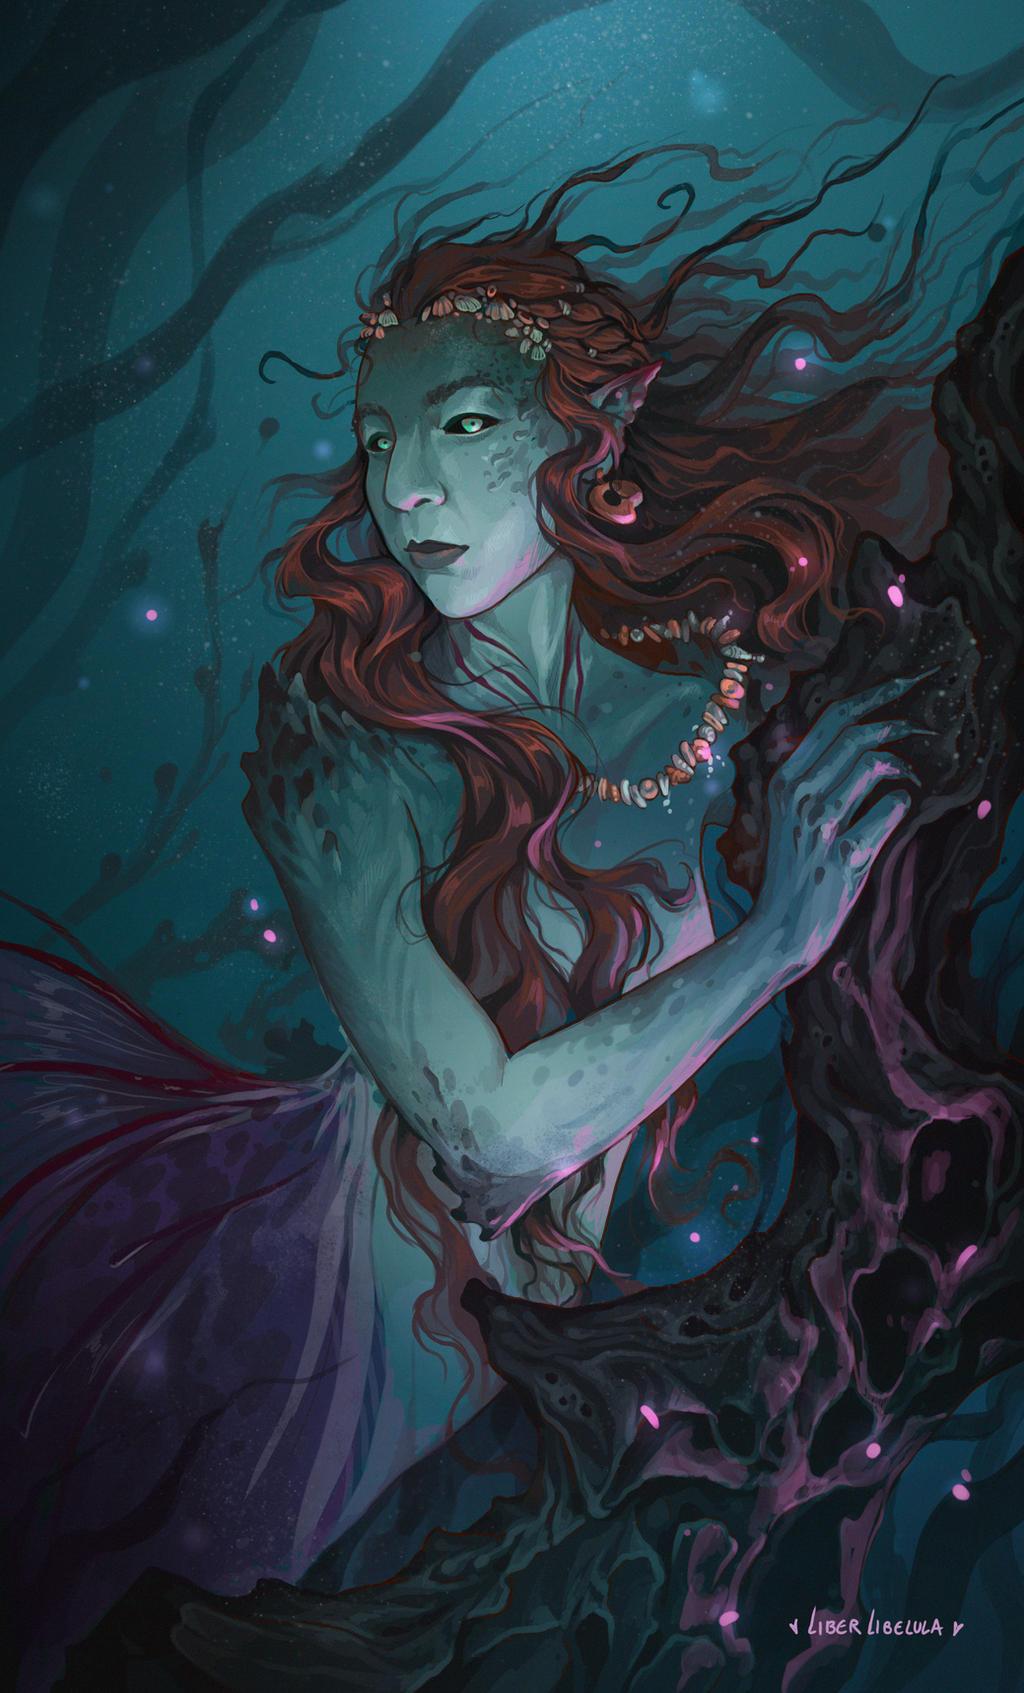 Kat the Mermaid by LiberLibelula